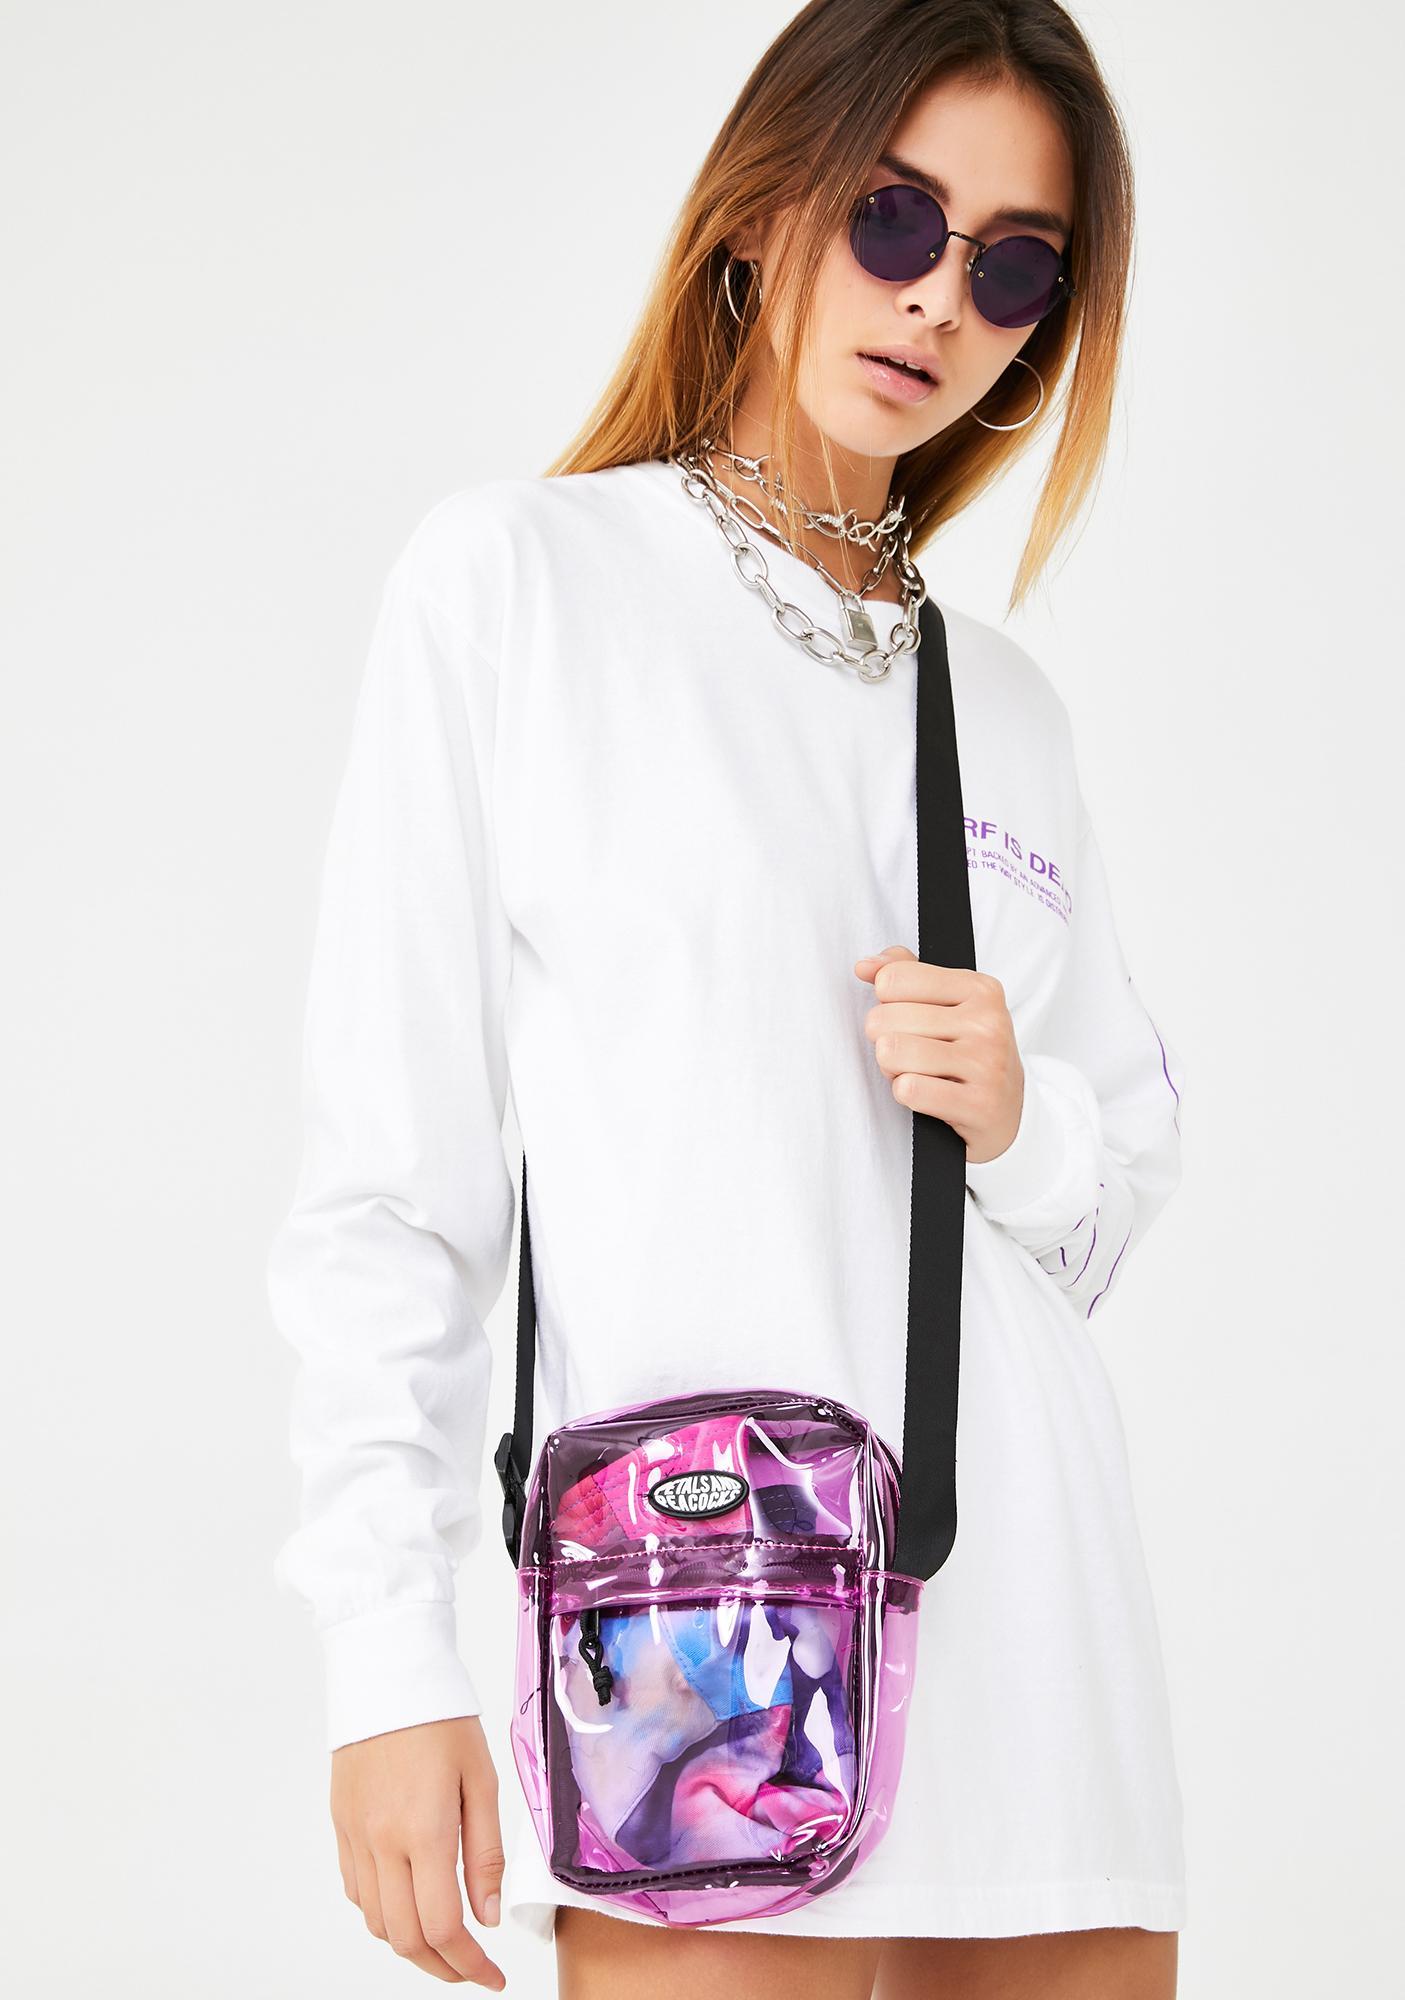 Petals and Peacocks Candy Iridescent Shoulder Bag